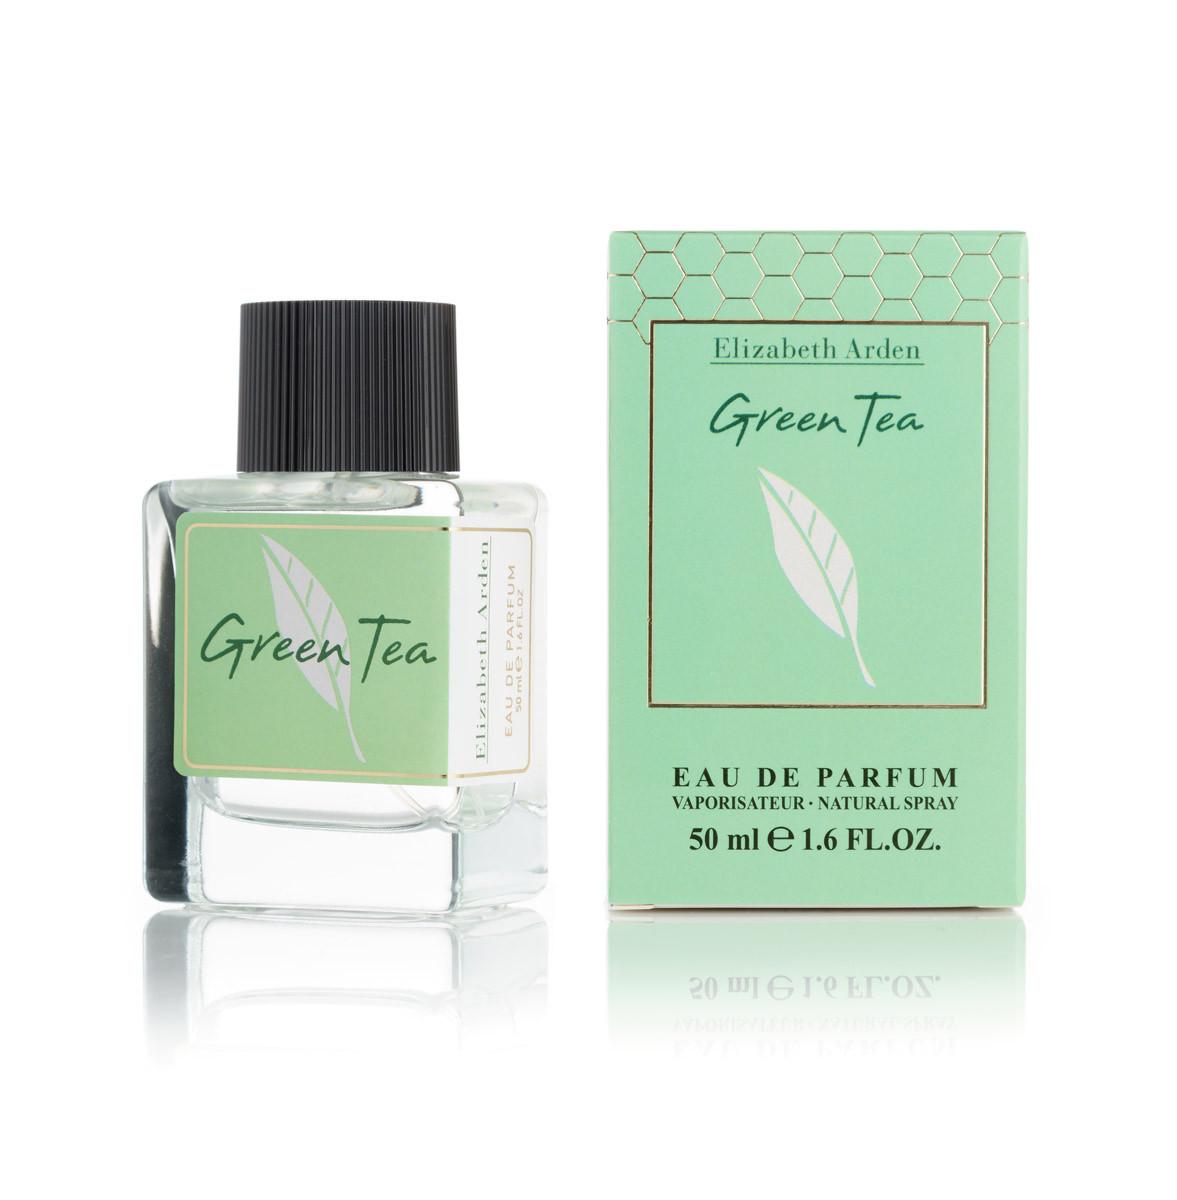 Жіночий парфум Elizabeth Arden Green Tea - 60 мл